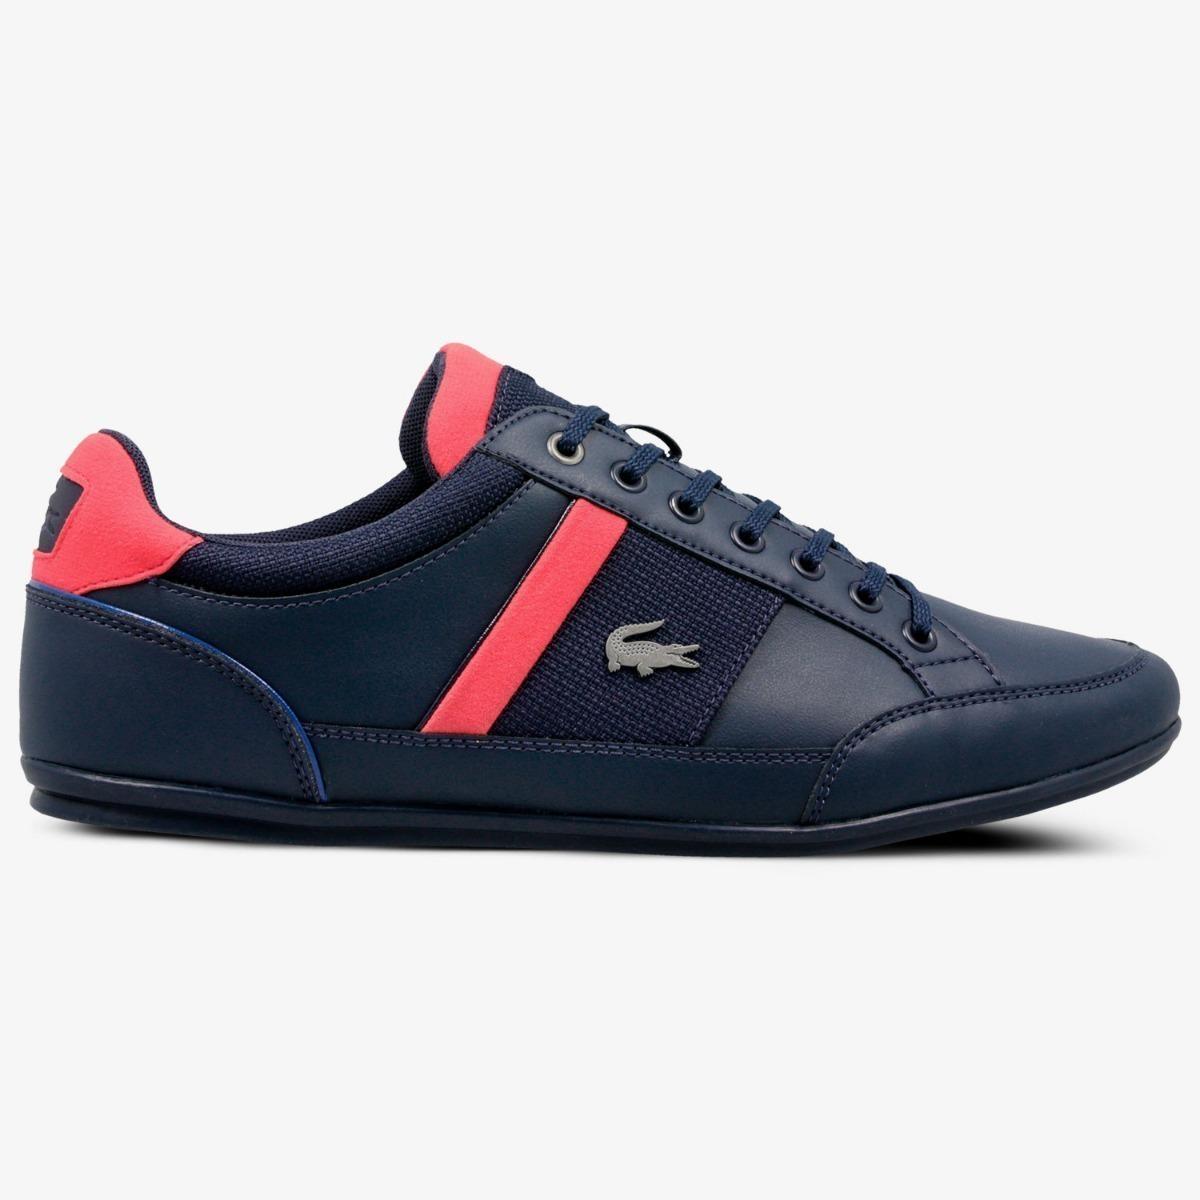 f4f6188ba6e tenis lacoste chaymon 318 1 azul-rojo caballero. Cargando zoom.